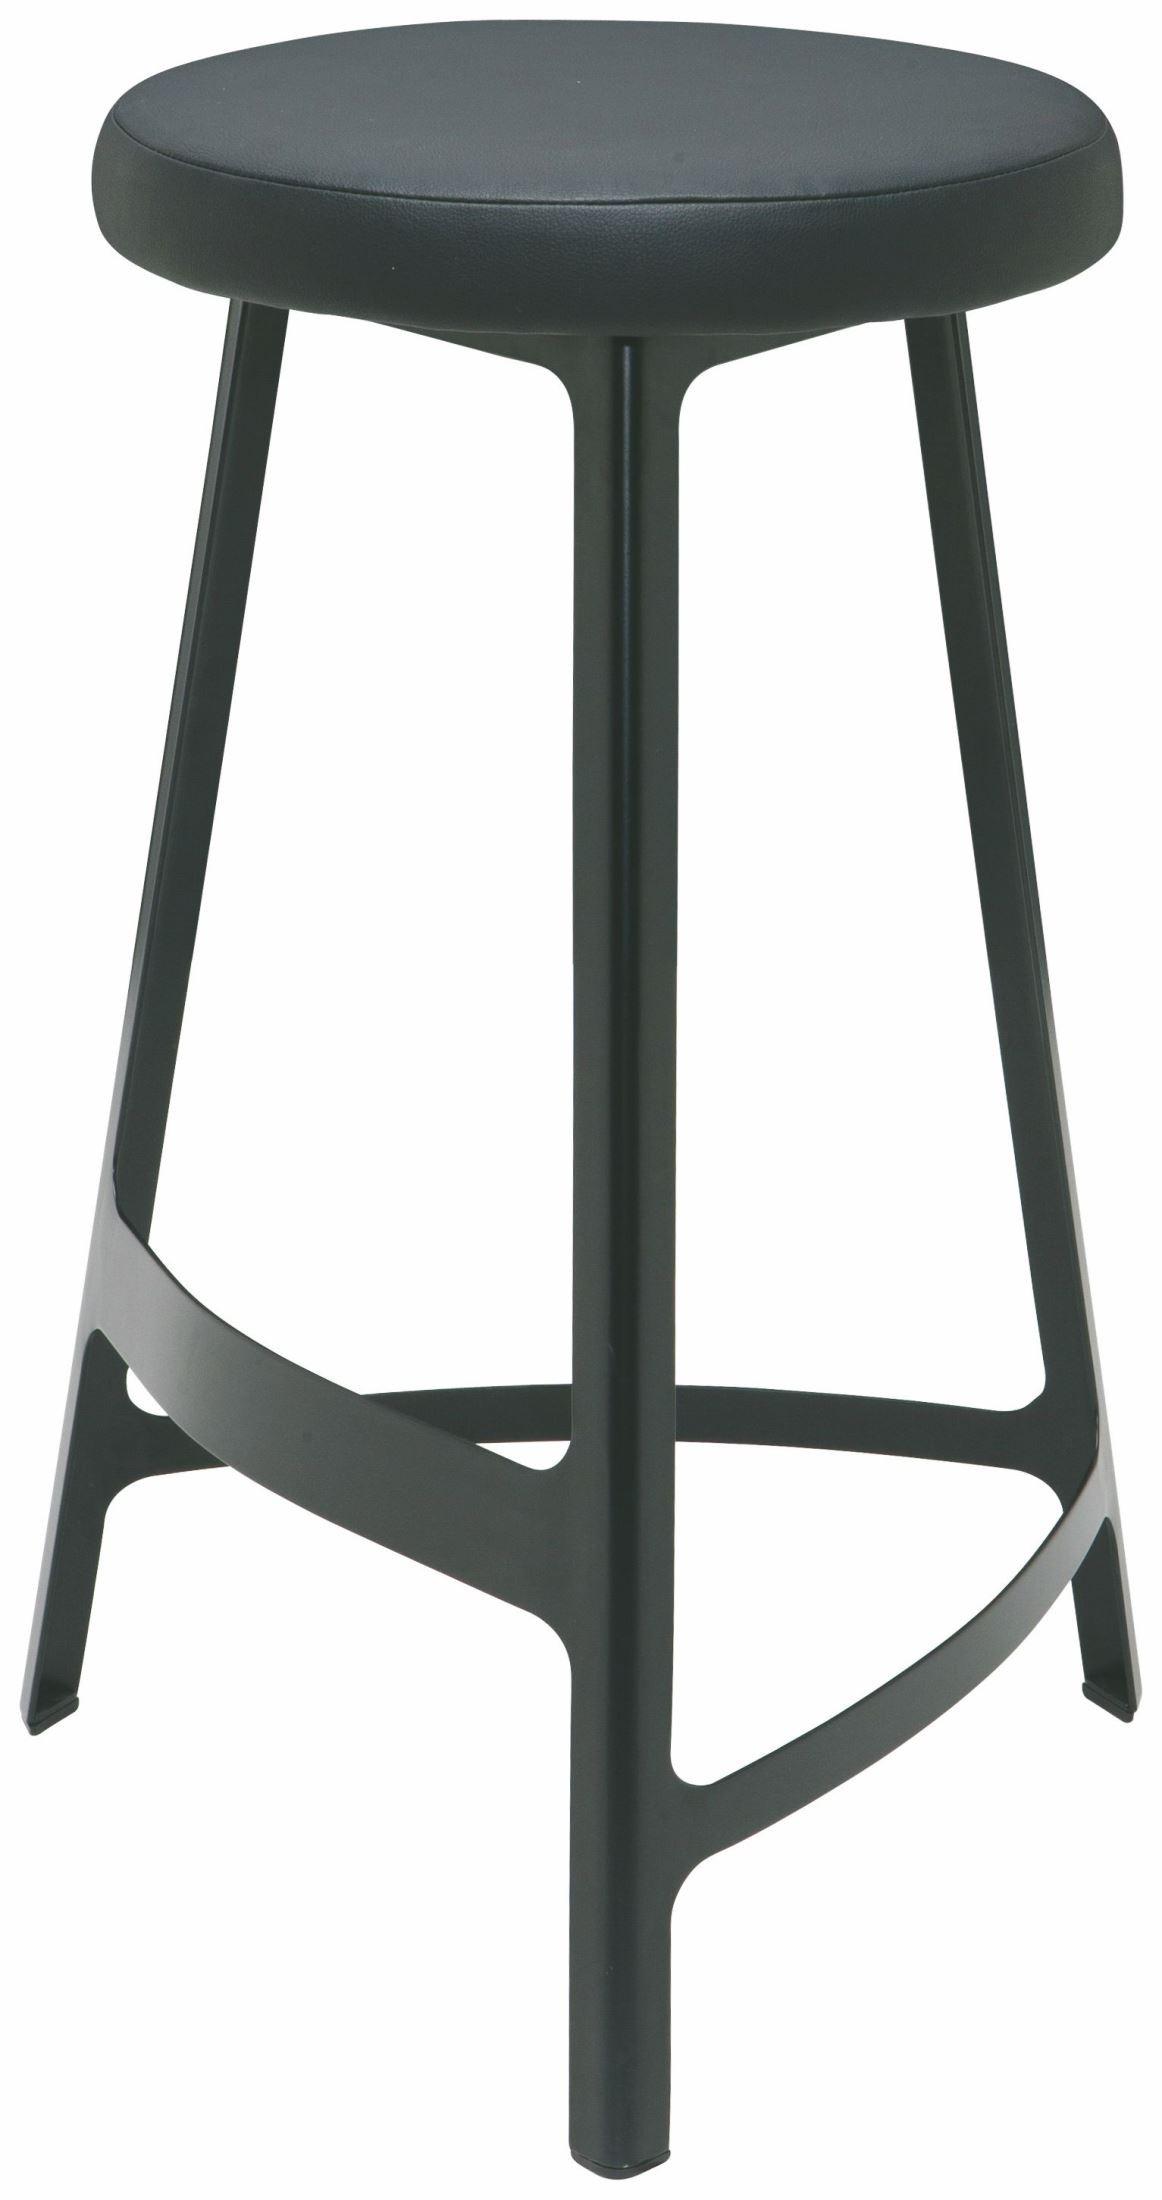 Hyku black naugahyde counter stool from nuevo coleman for Black counter stools